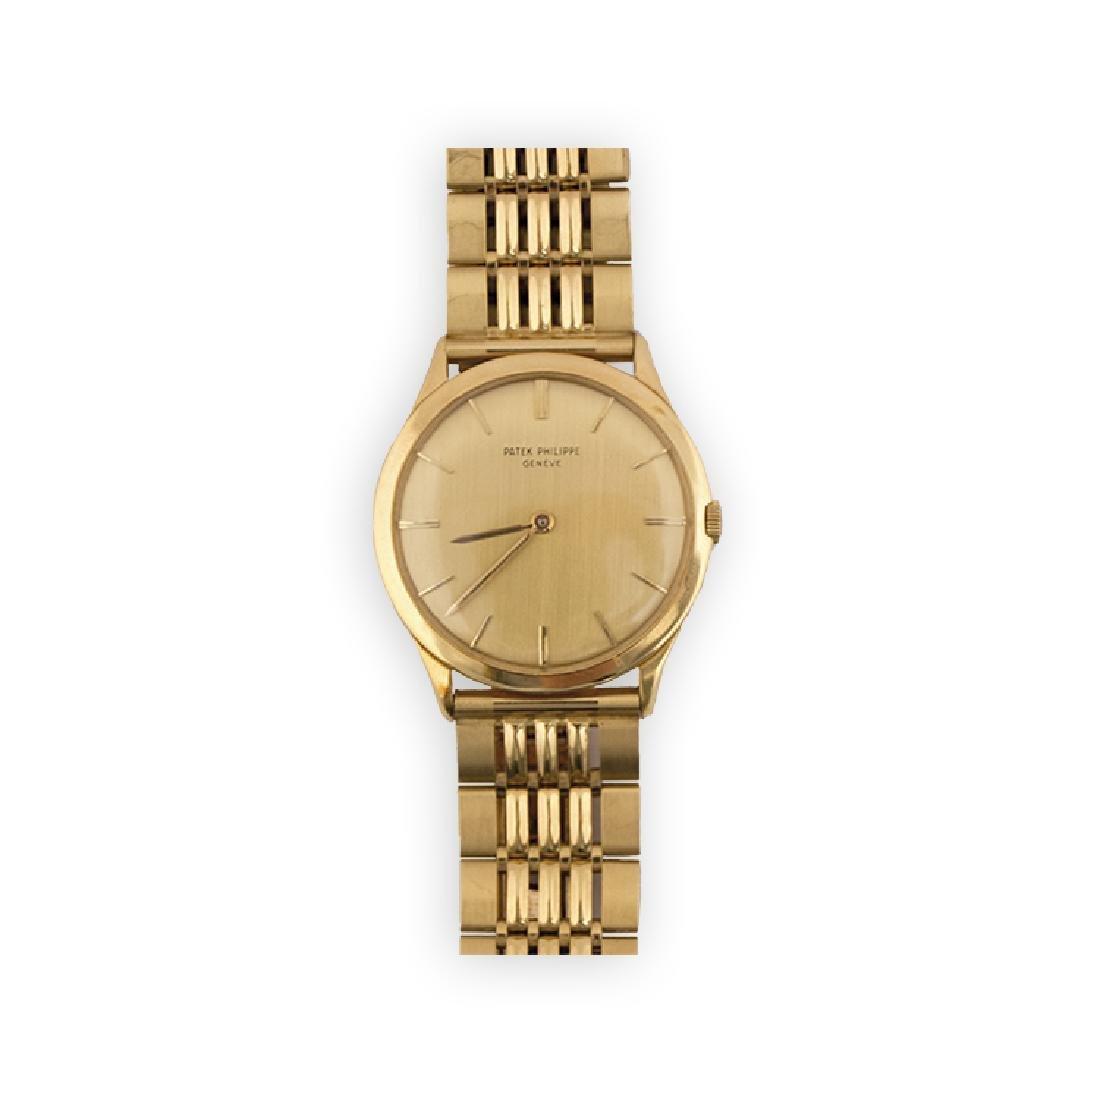 PATEK PHILIPPE gold Calatrava watch